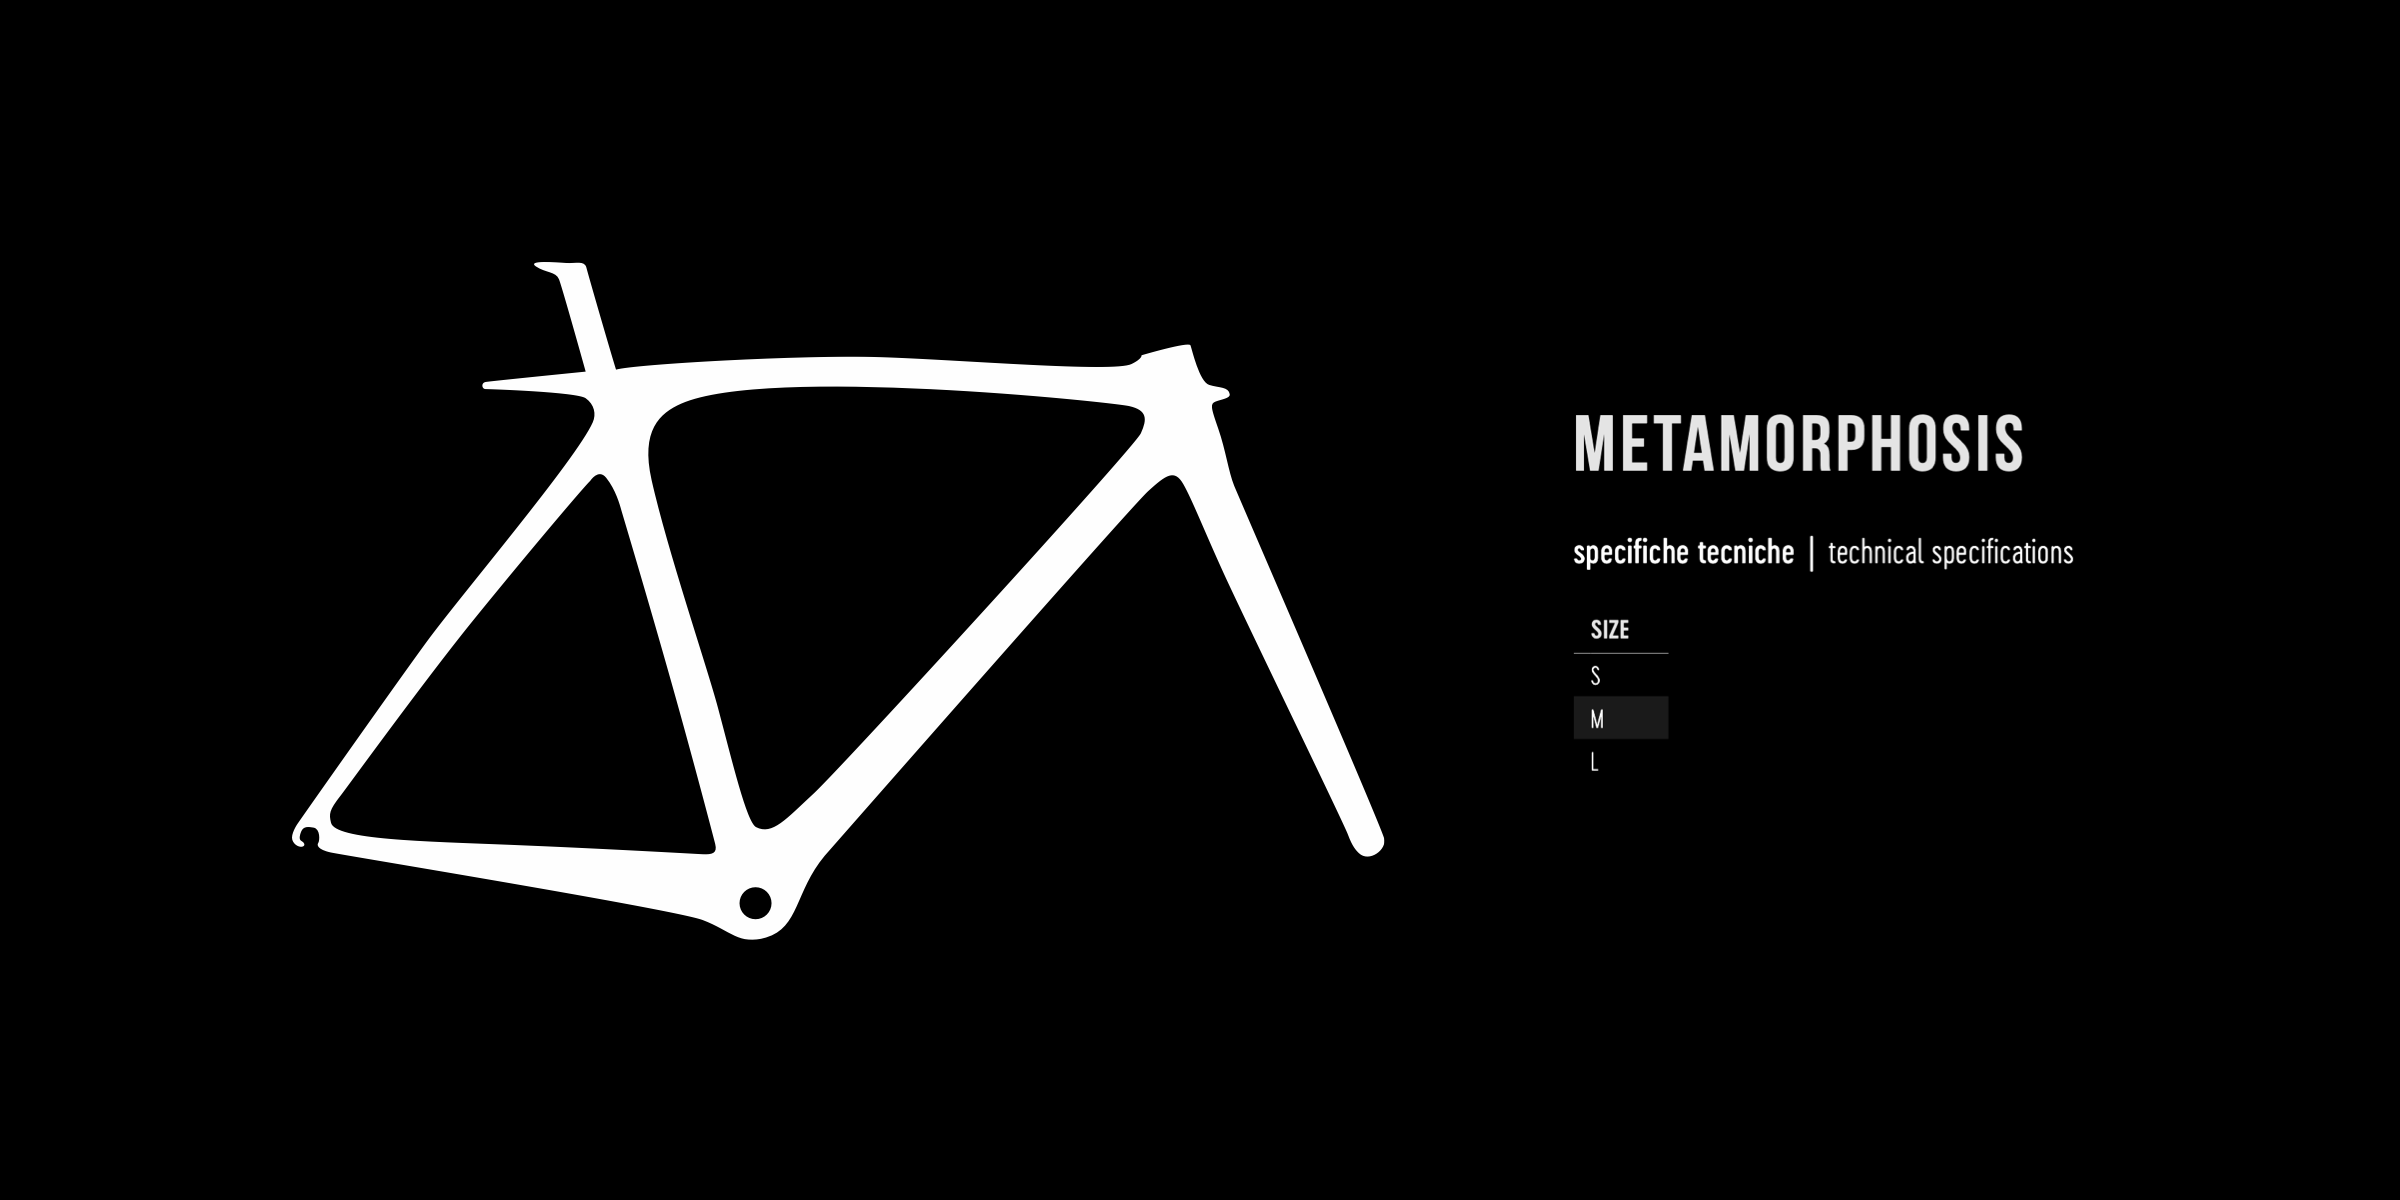 De Rosa geometry METAMORPHOSIS 2021